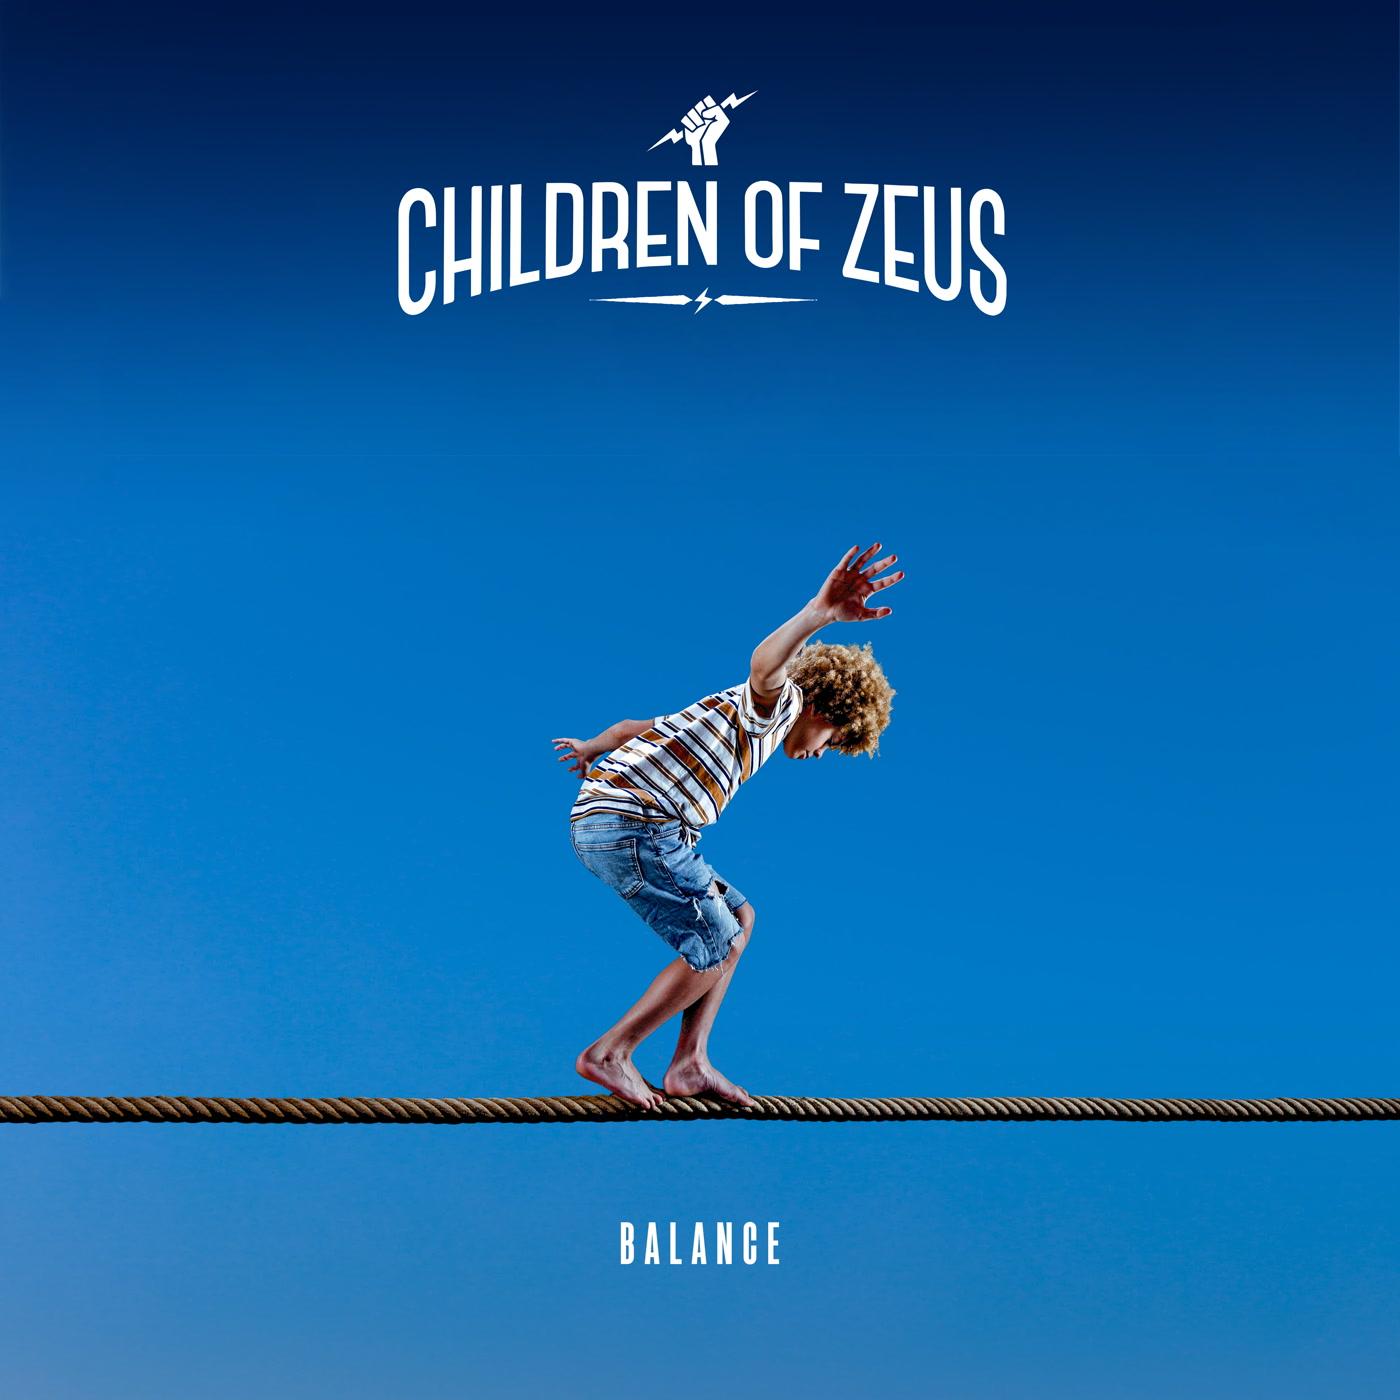 Children of Zeus – Balance (First Word Records)